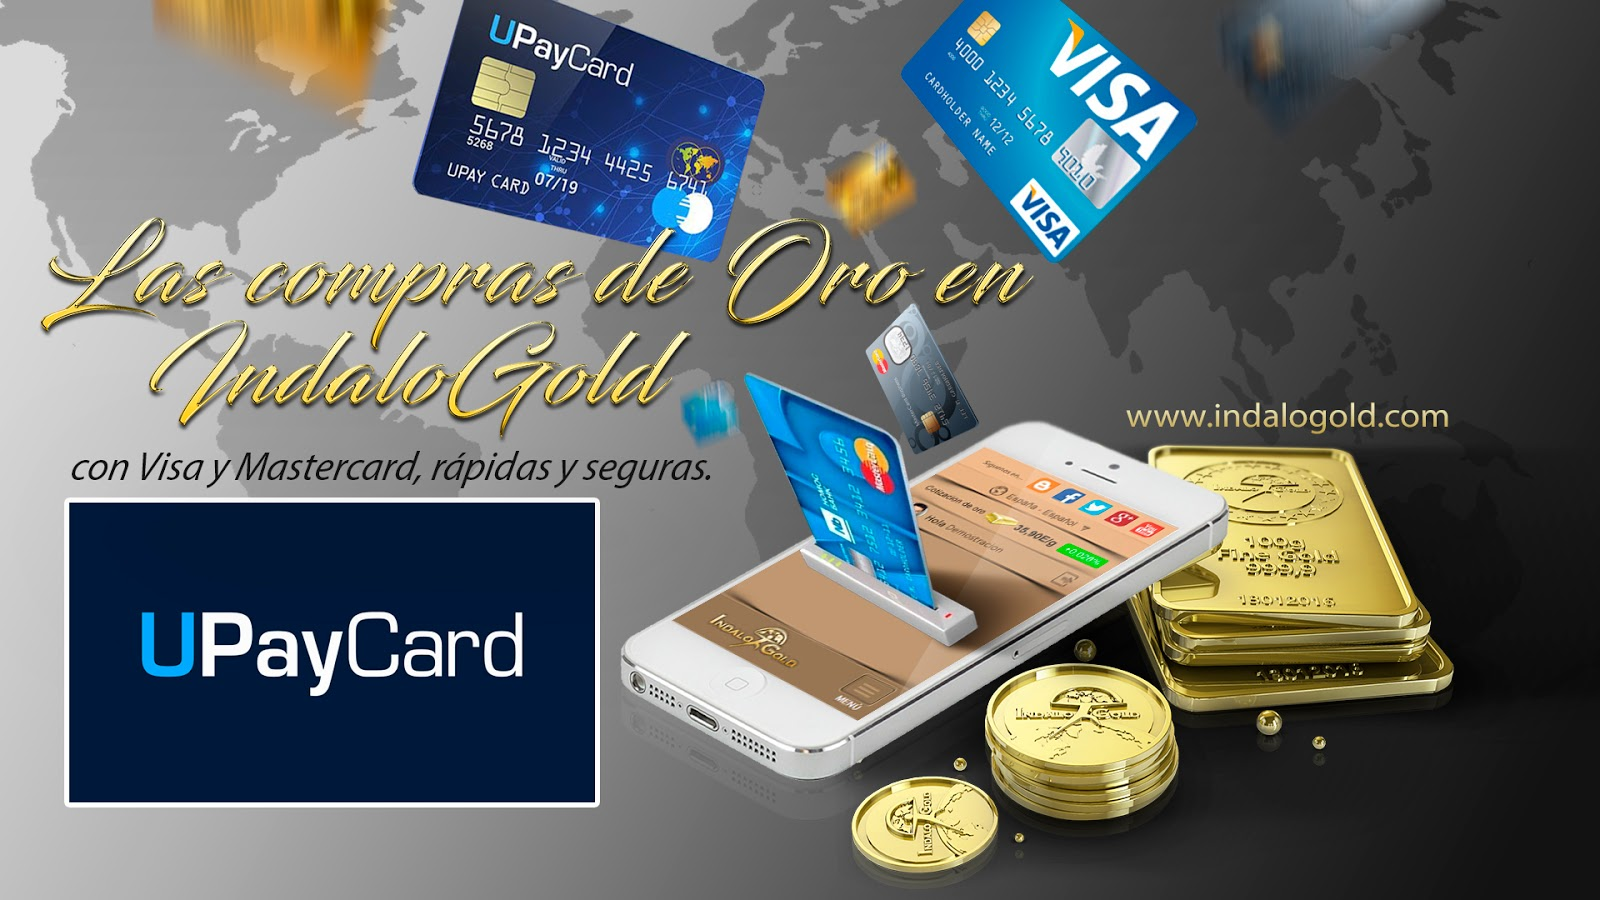 U Pay Card